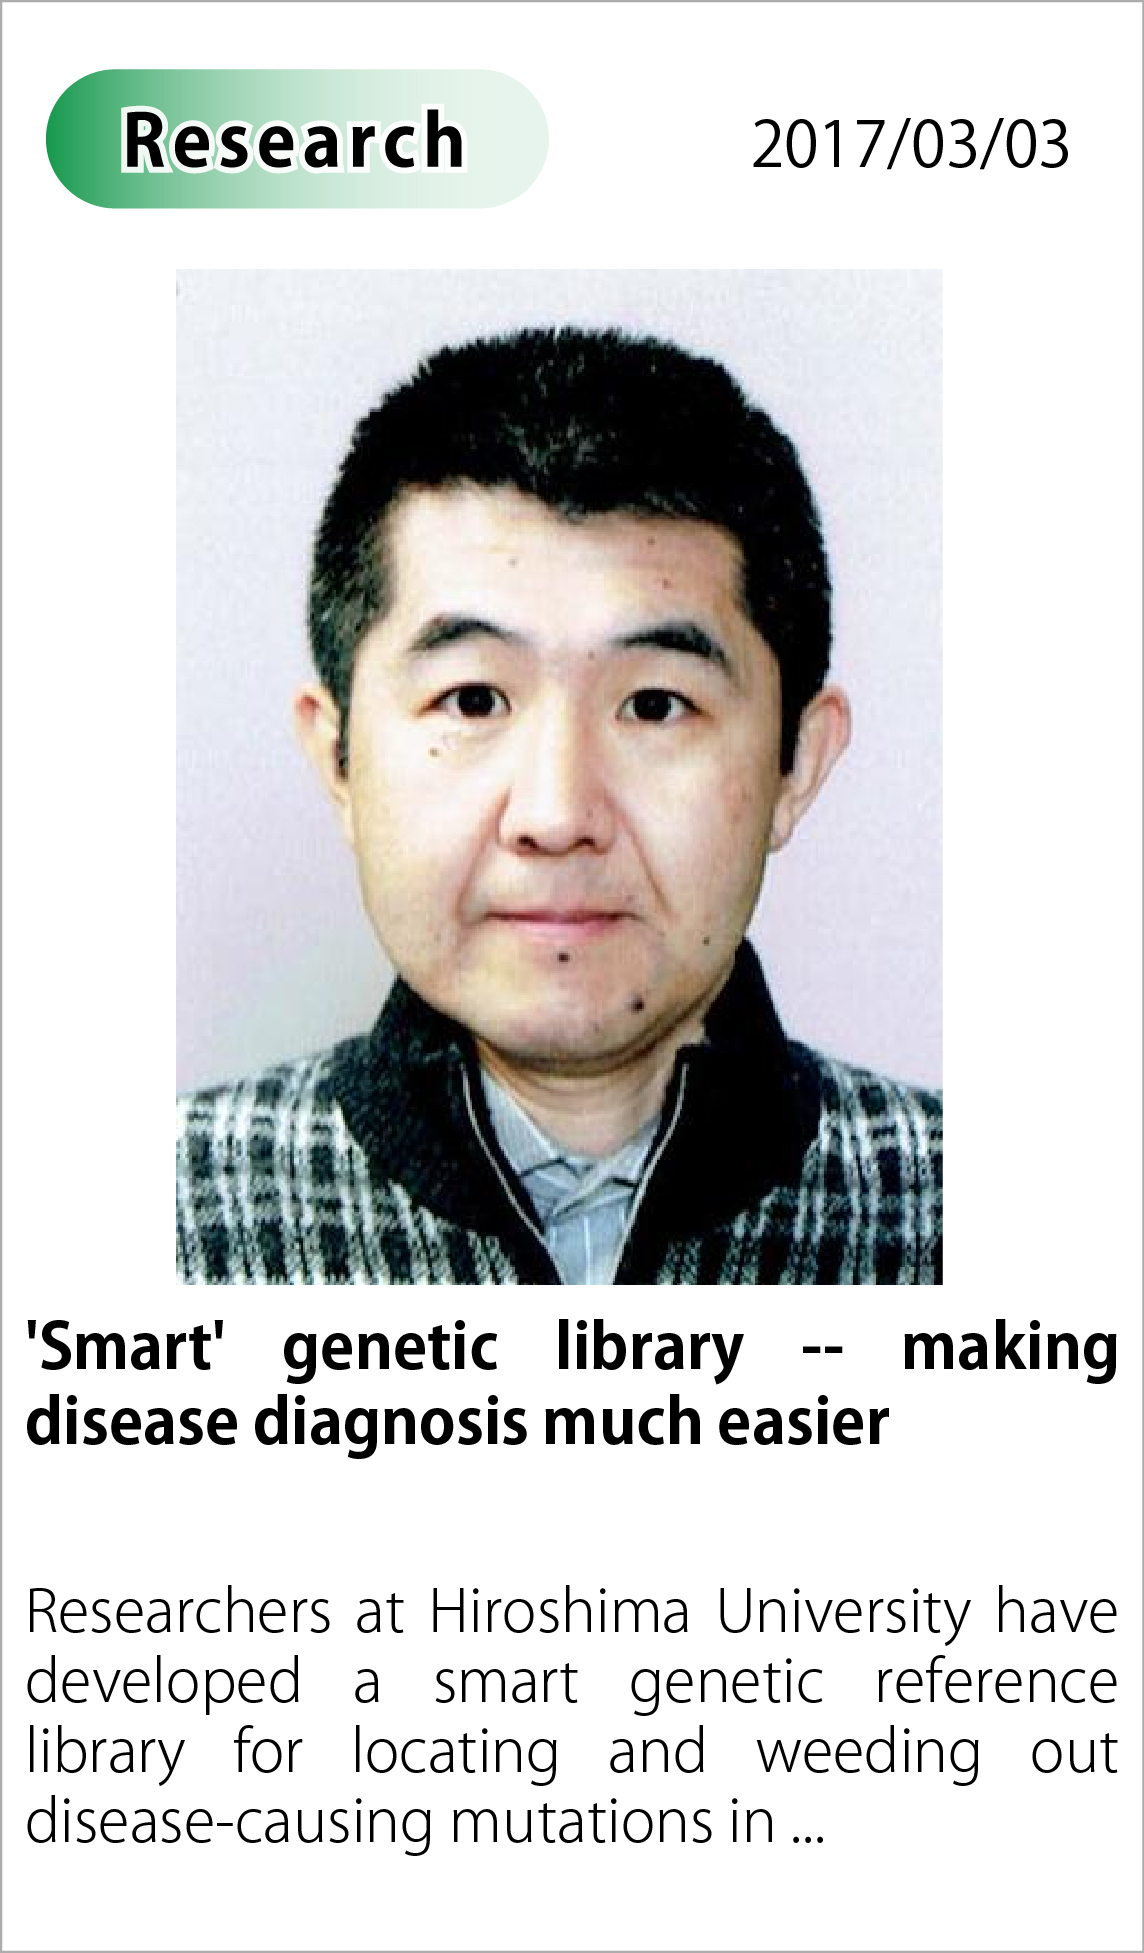 'Smart' genetic library -- making disease diagnosis much easier